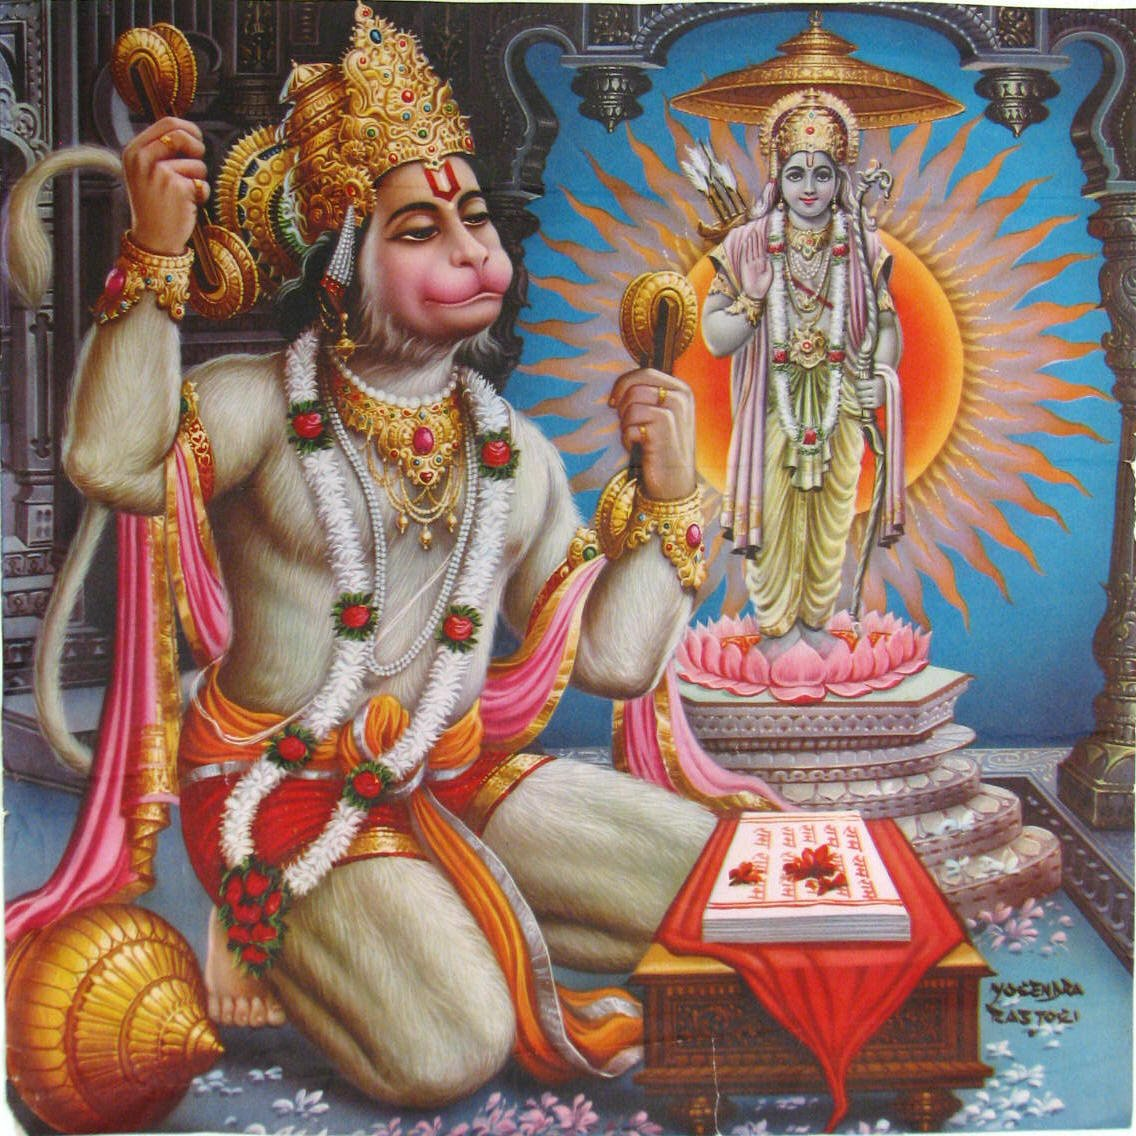 Photo Credit: http://hariharji.blogspot.in/2011/04/vinay-patrika-hymn-72-makes-humble.html